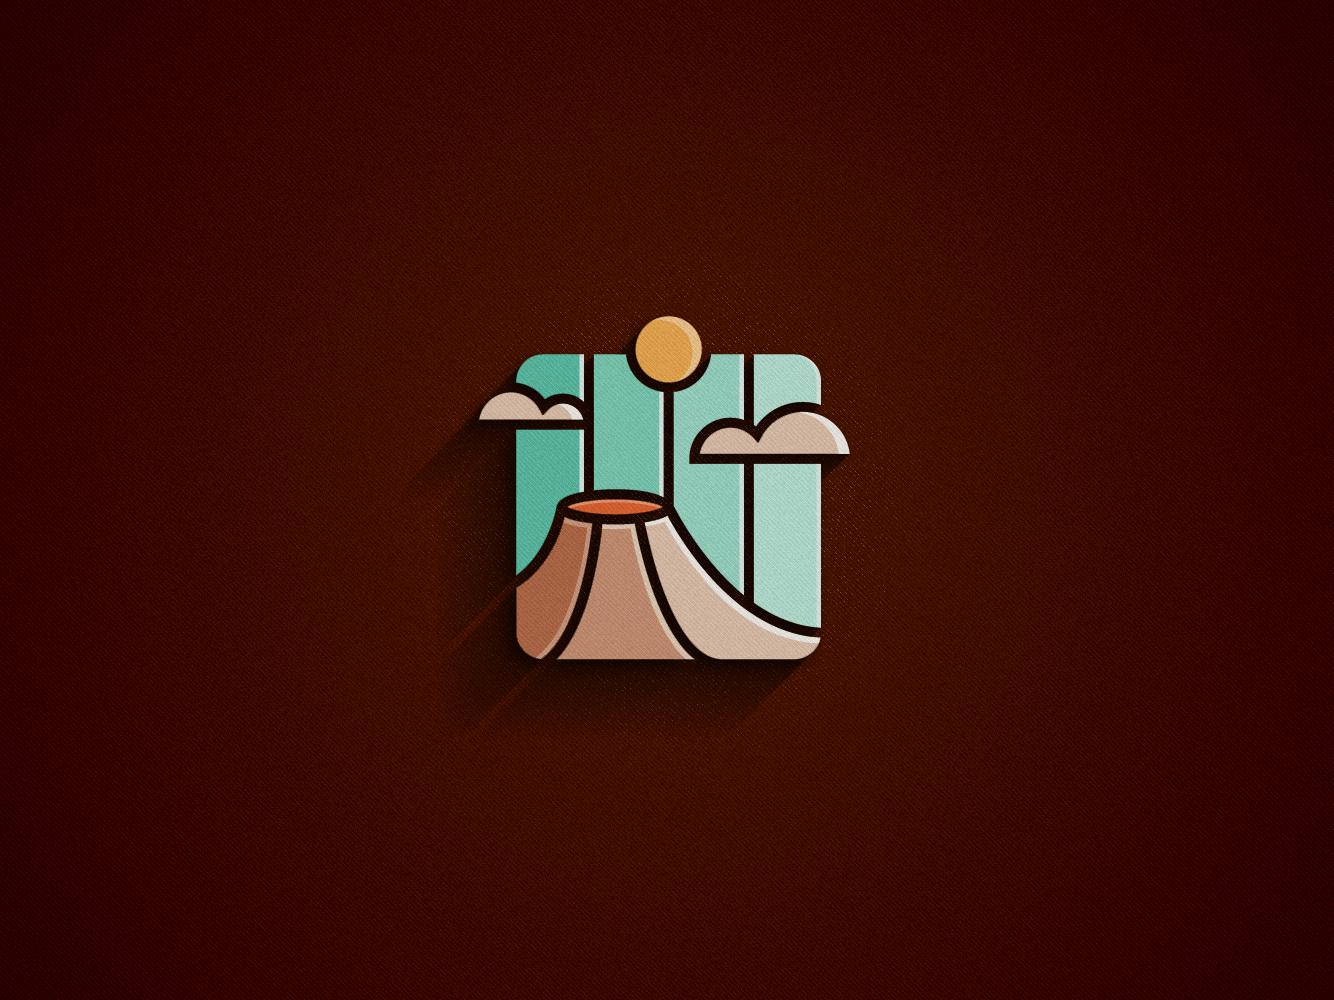 VOLCANO [logo concept] by Monkey Mark on Dribbble.